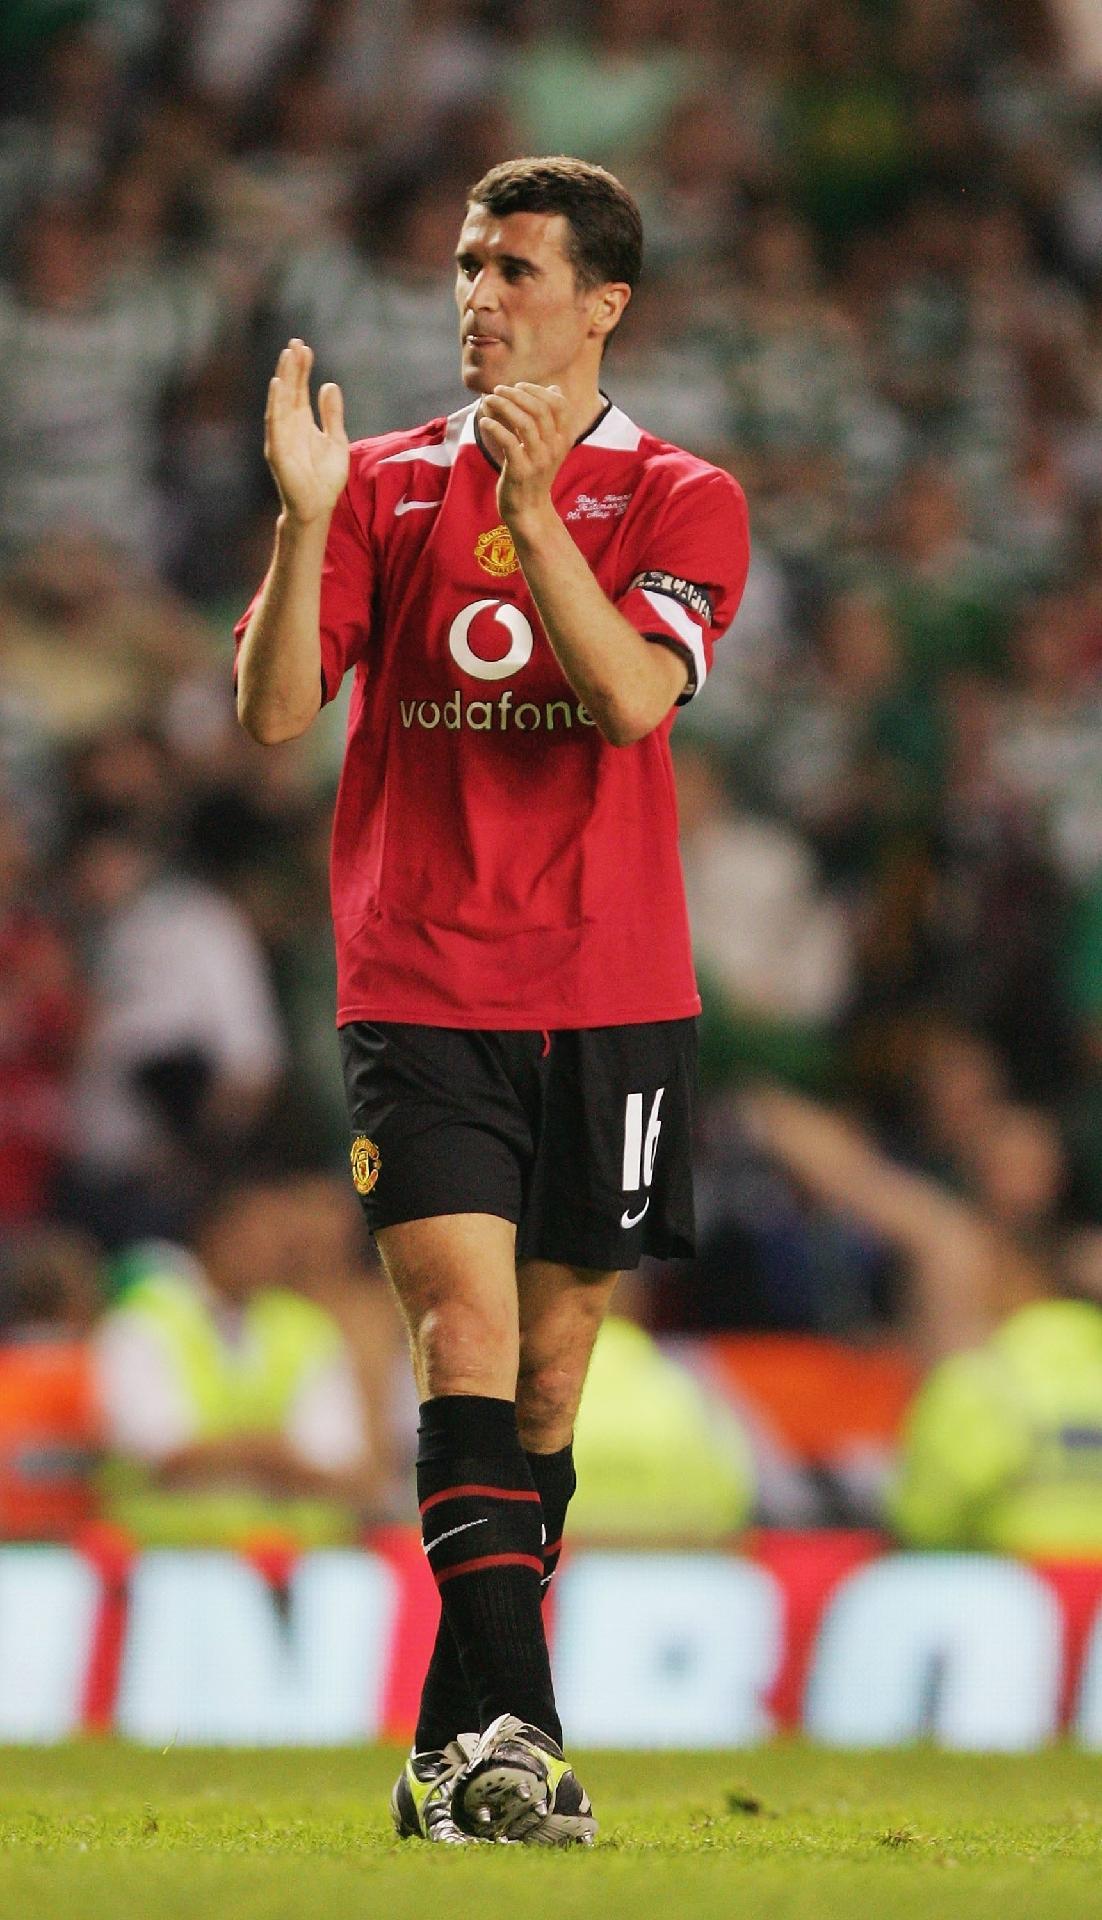 Roy Keane, enquanto atuava no Manchester United